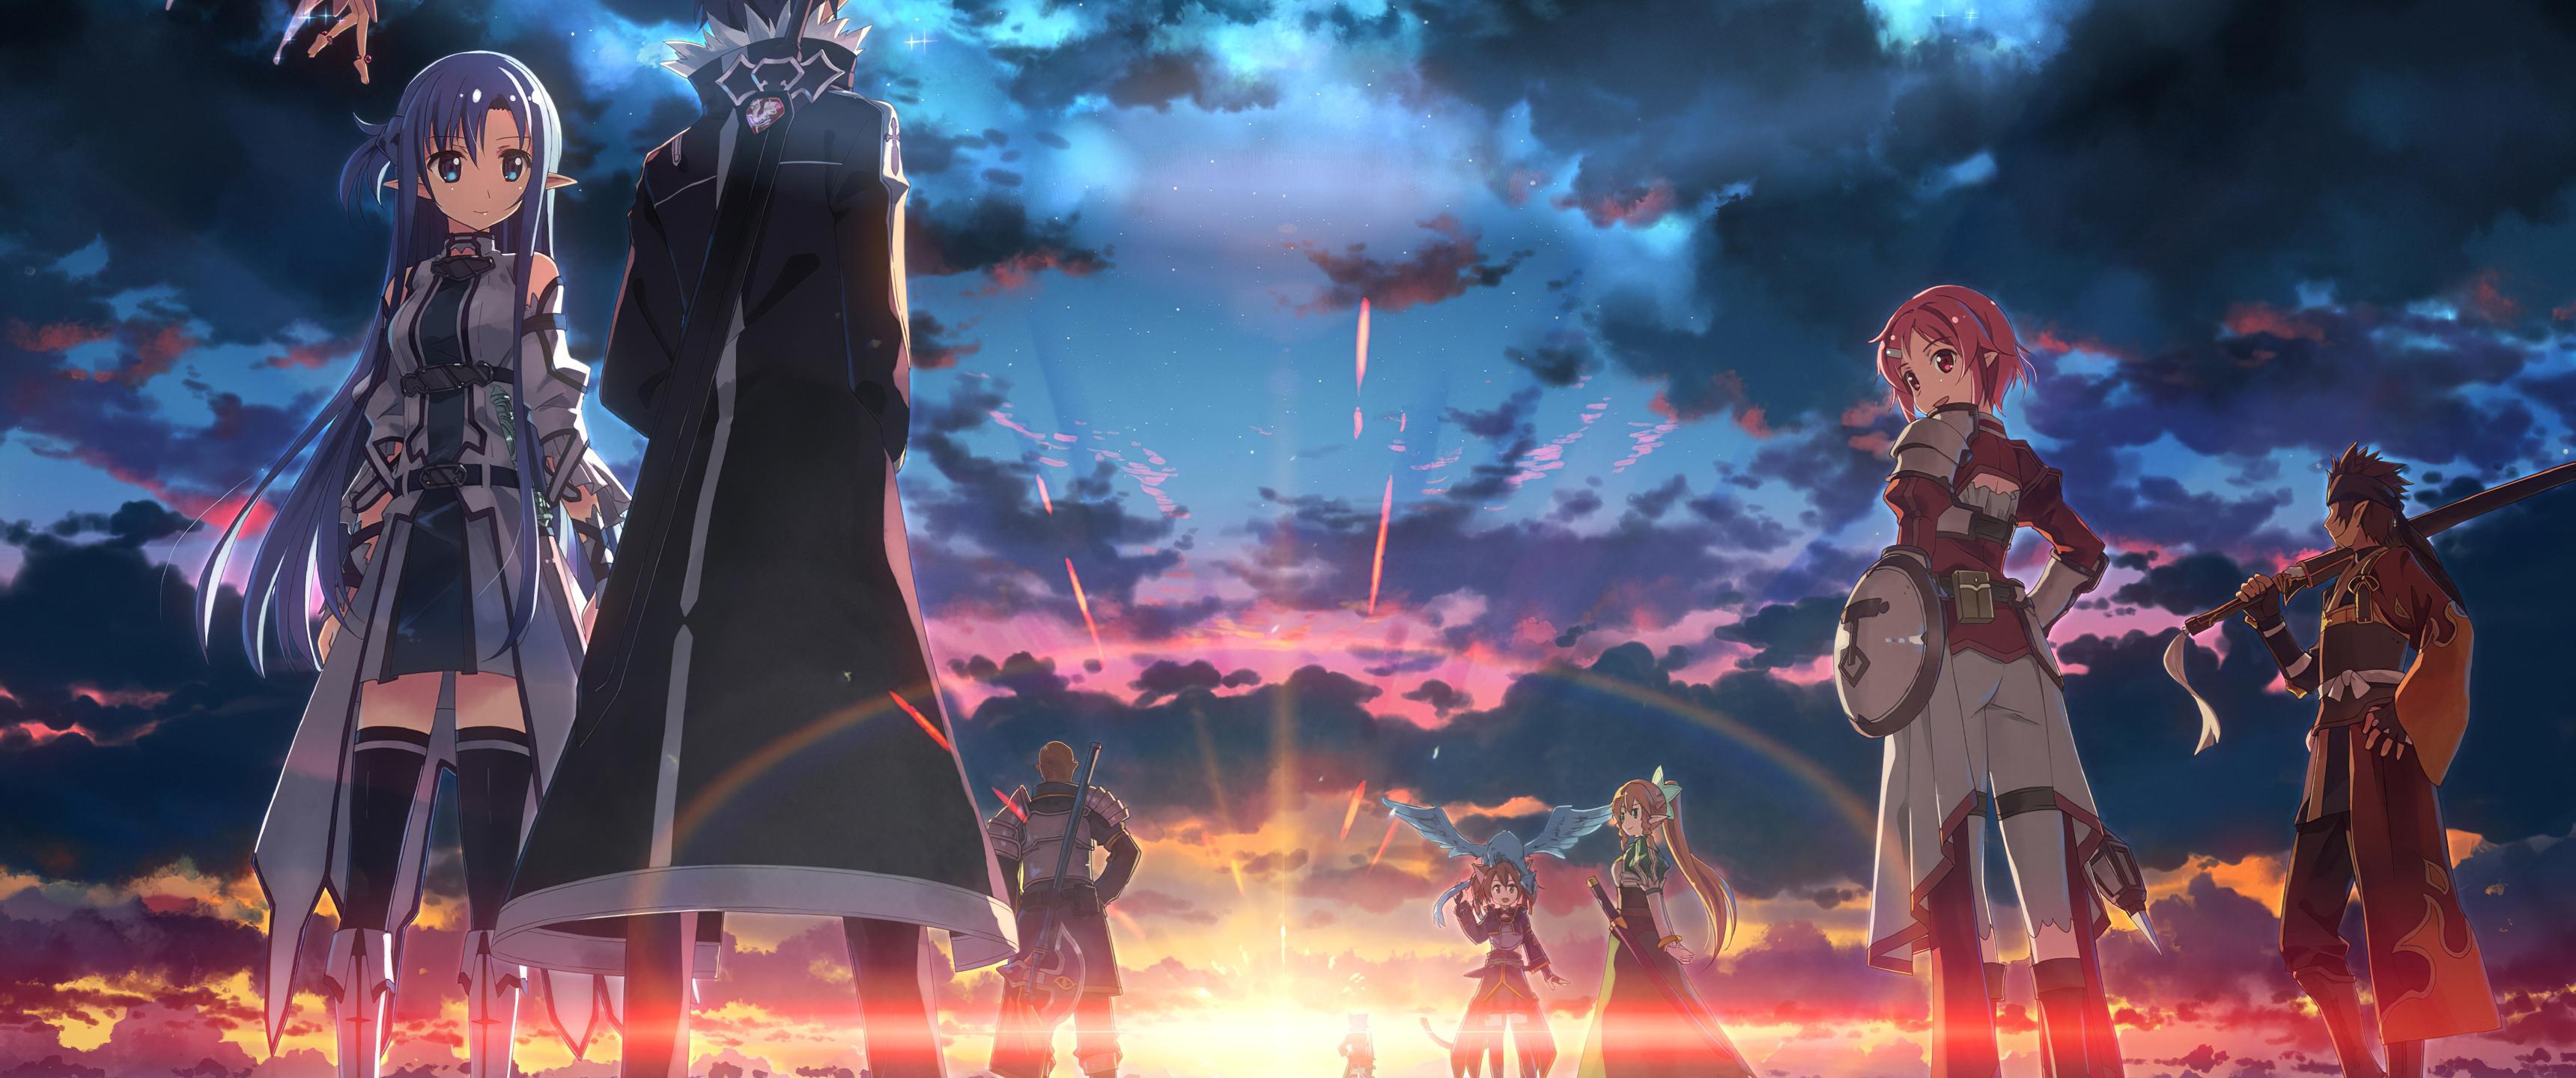 3440x1440 Sword Art Online Anime 4k 3440x1440 Resolution Hd 4k